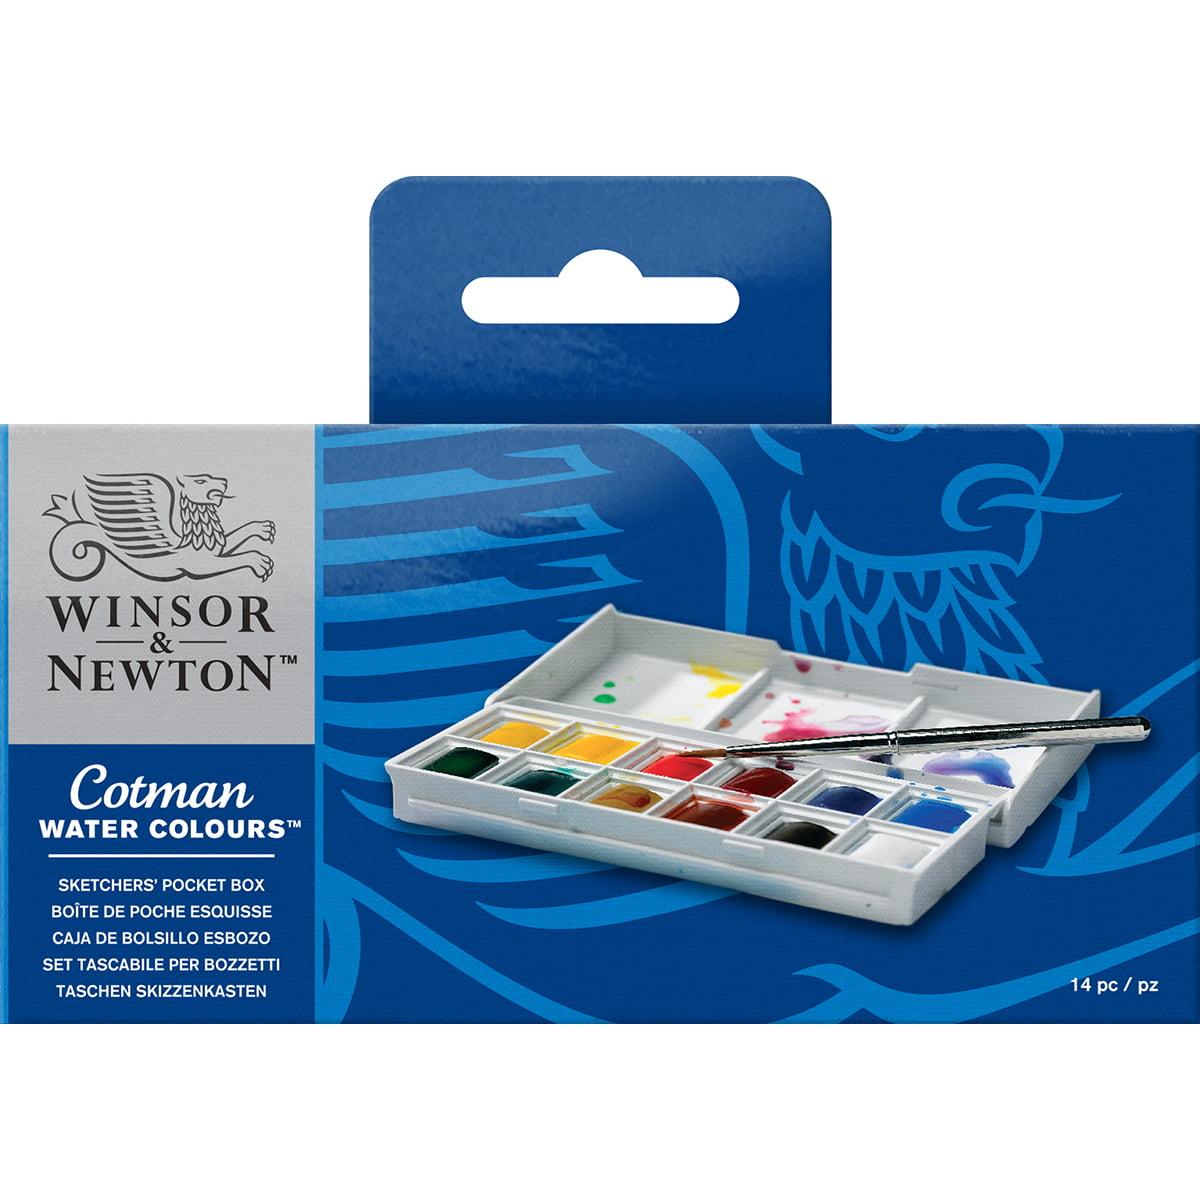 Winsor & Newton Cotman Watercolor - Sketchers Pocket Box